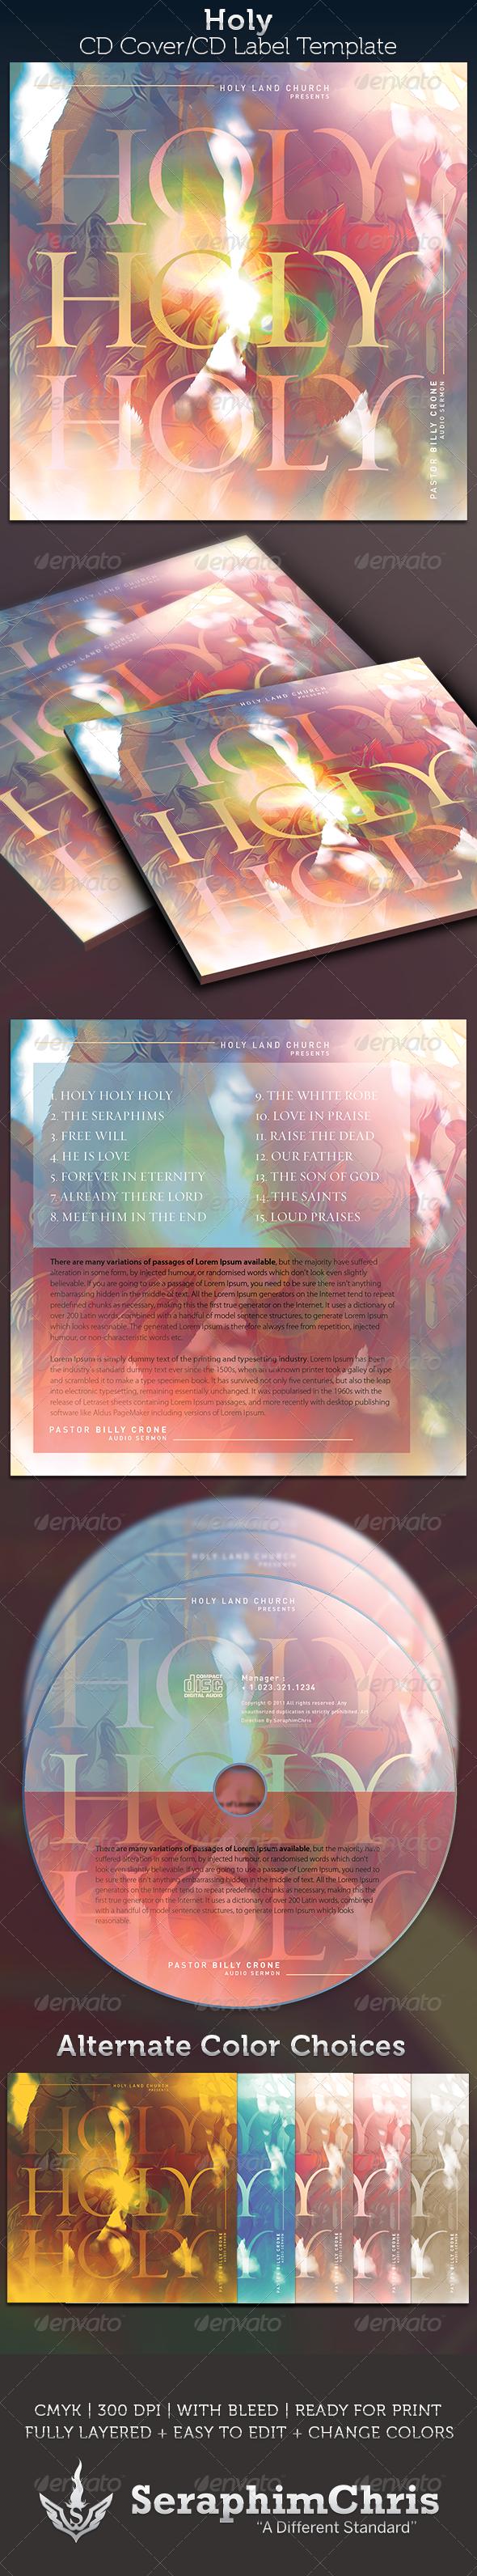 Holy, Holy,Holy CD Cover Artwork Template - CD & DVD Artwork Print Templates